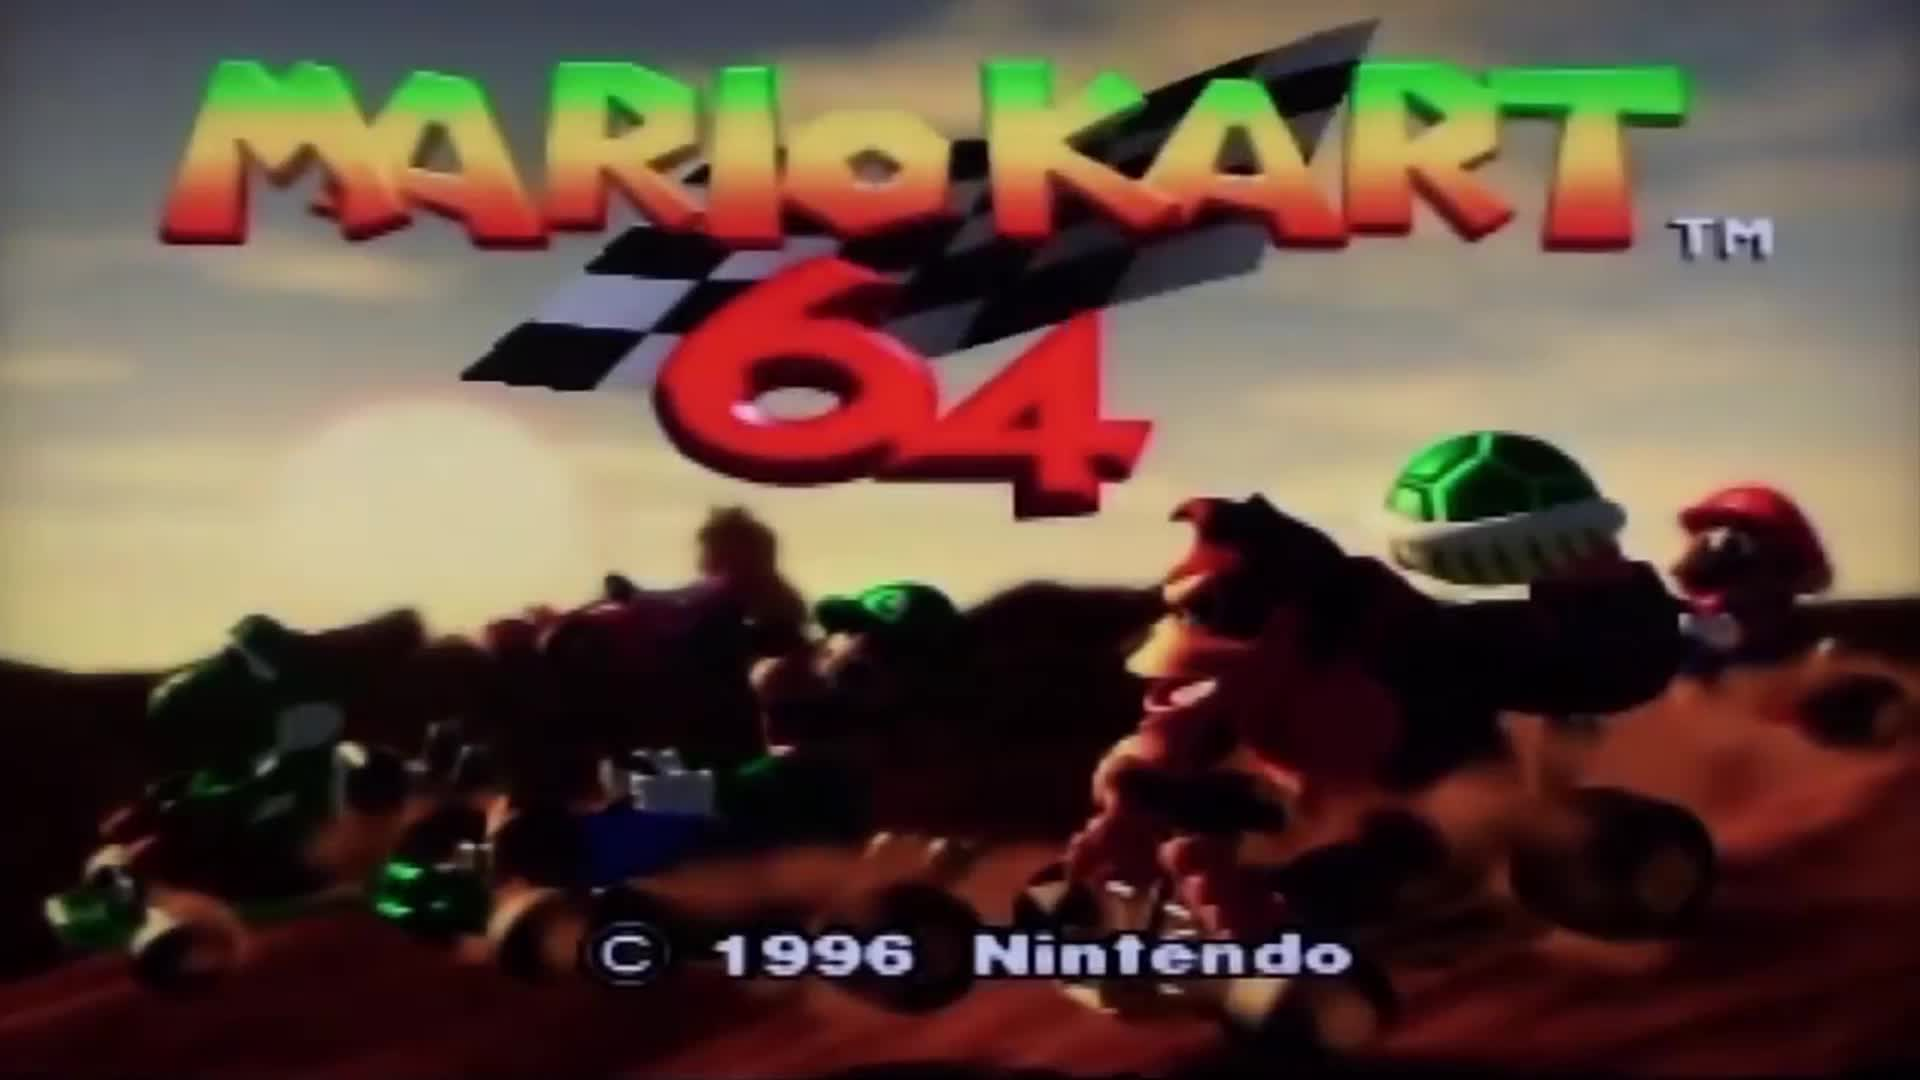 MarioKart GIFs